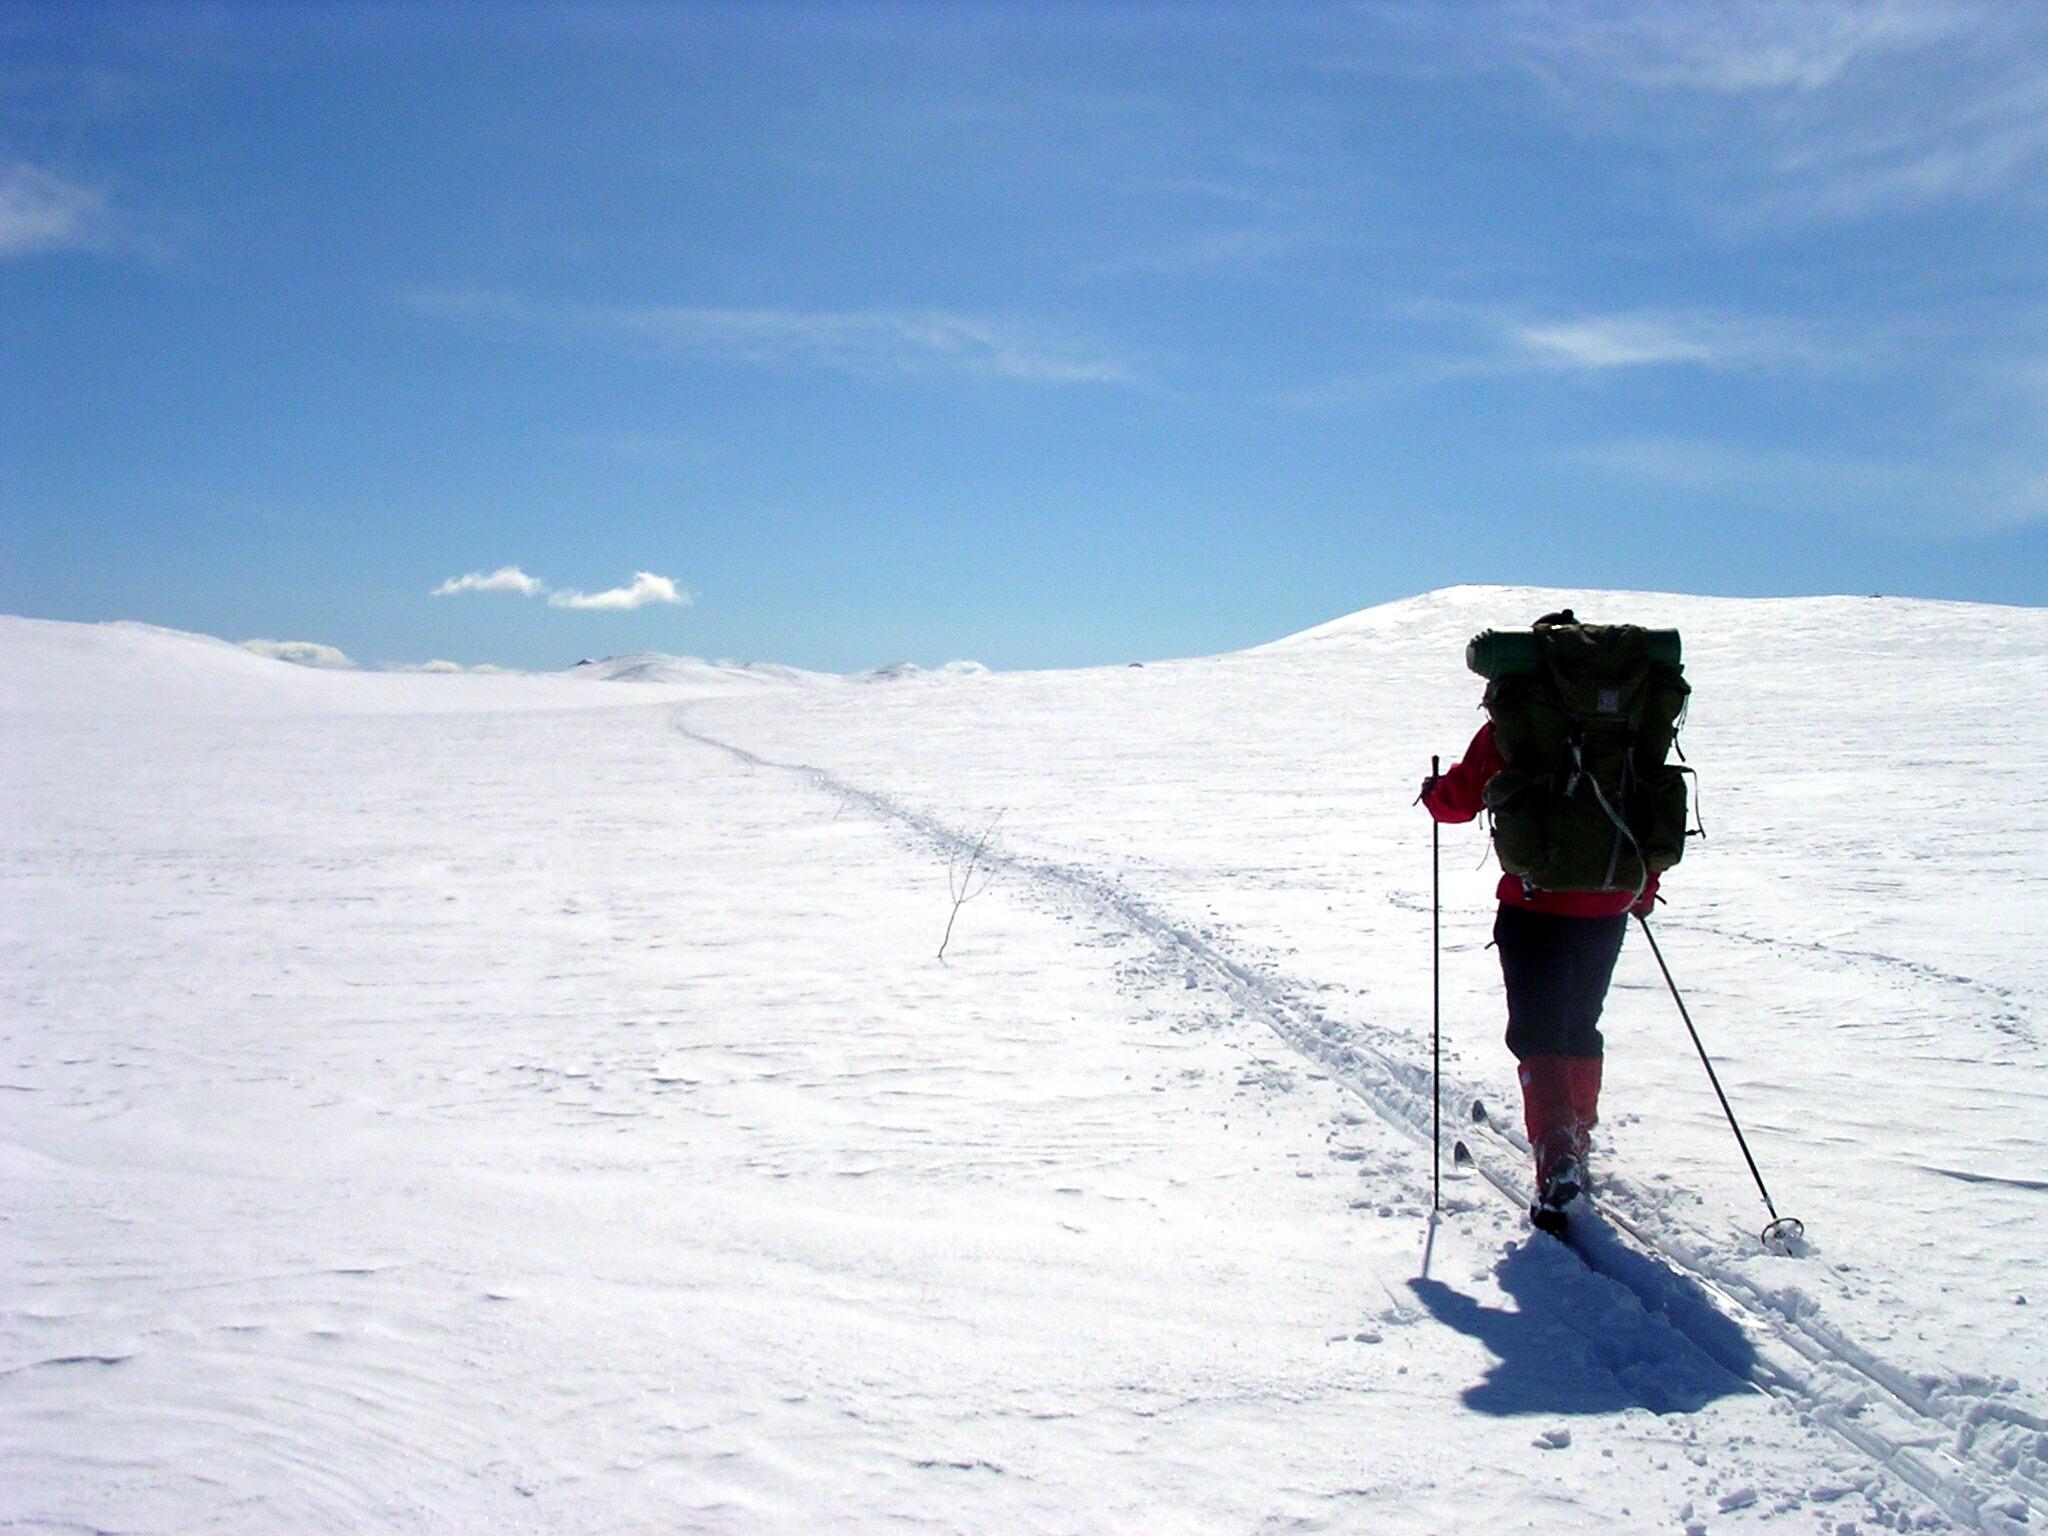 c date norge Ski